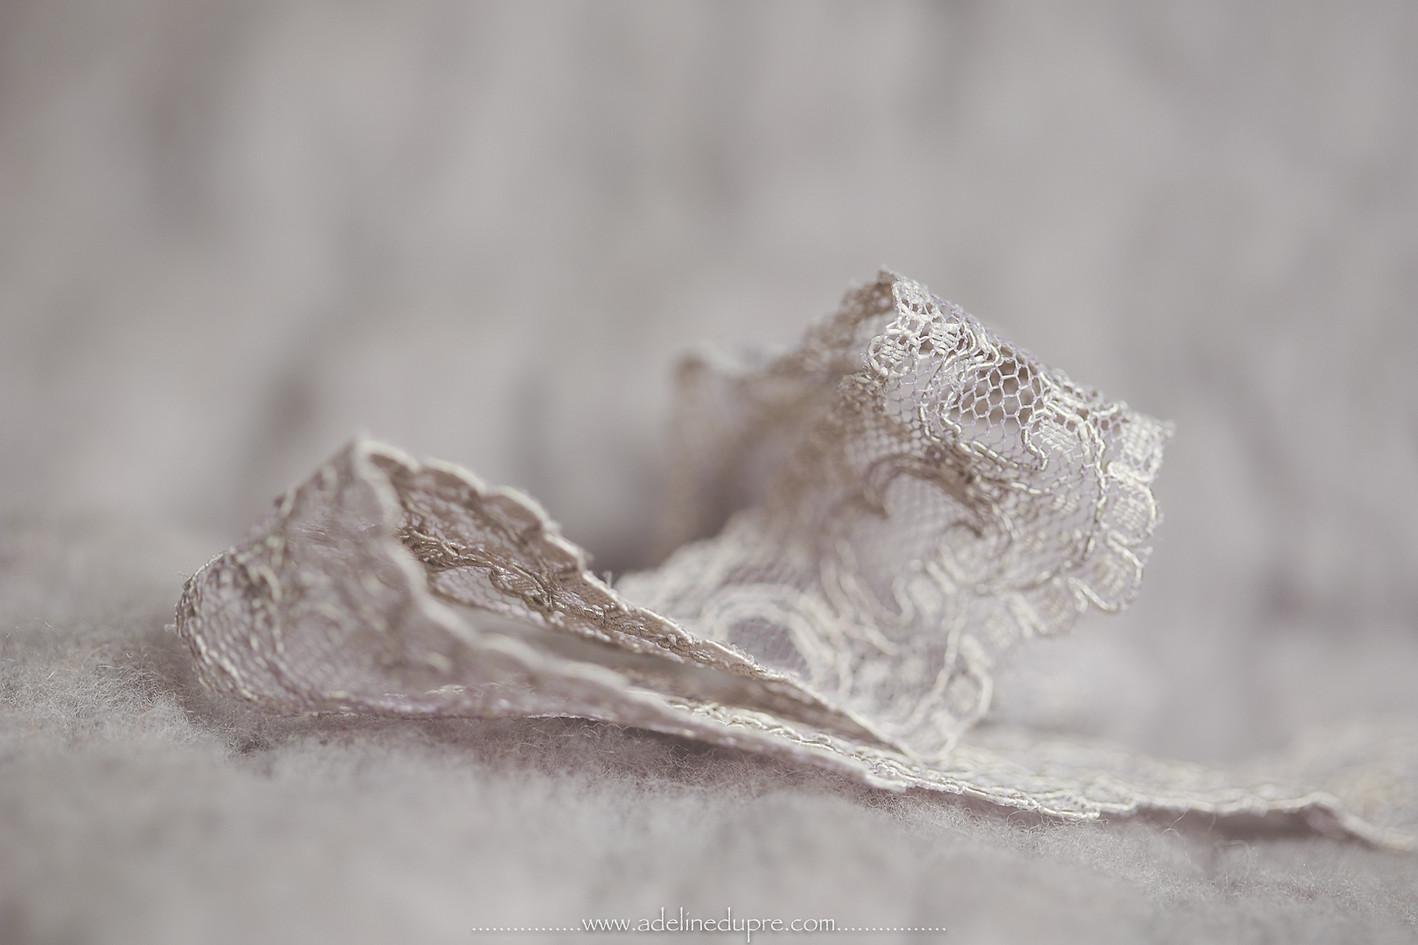 Adeline Dupre Photographe-0353.jpg